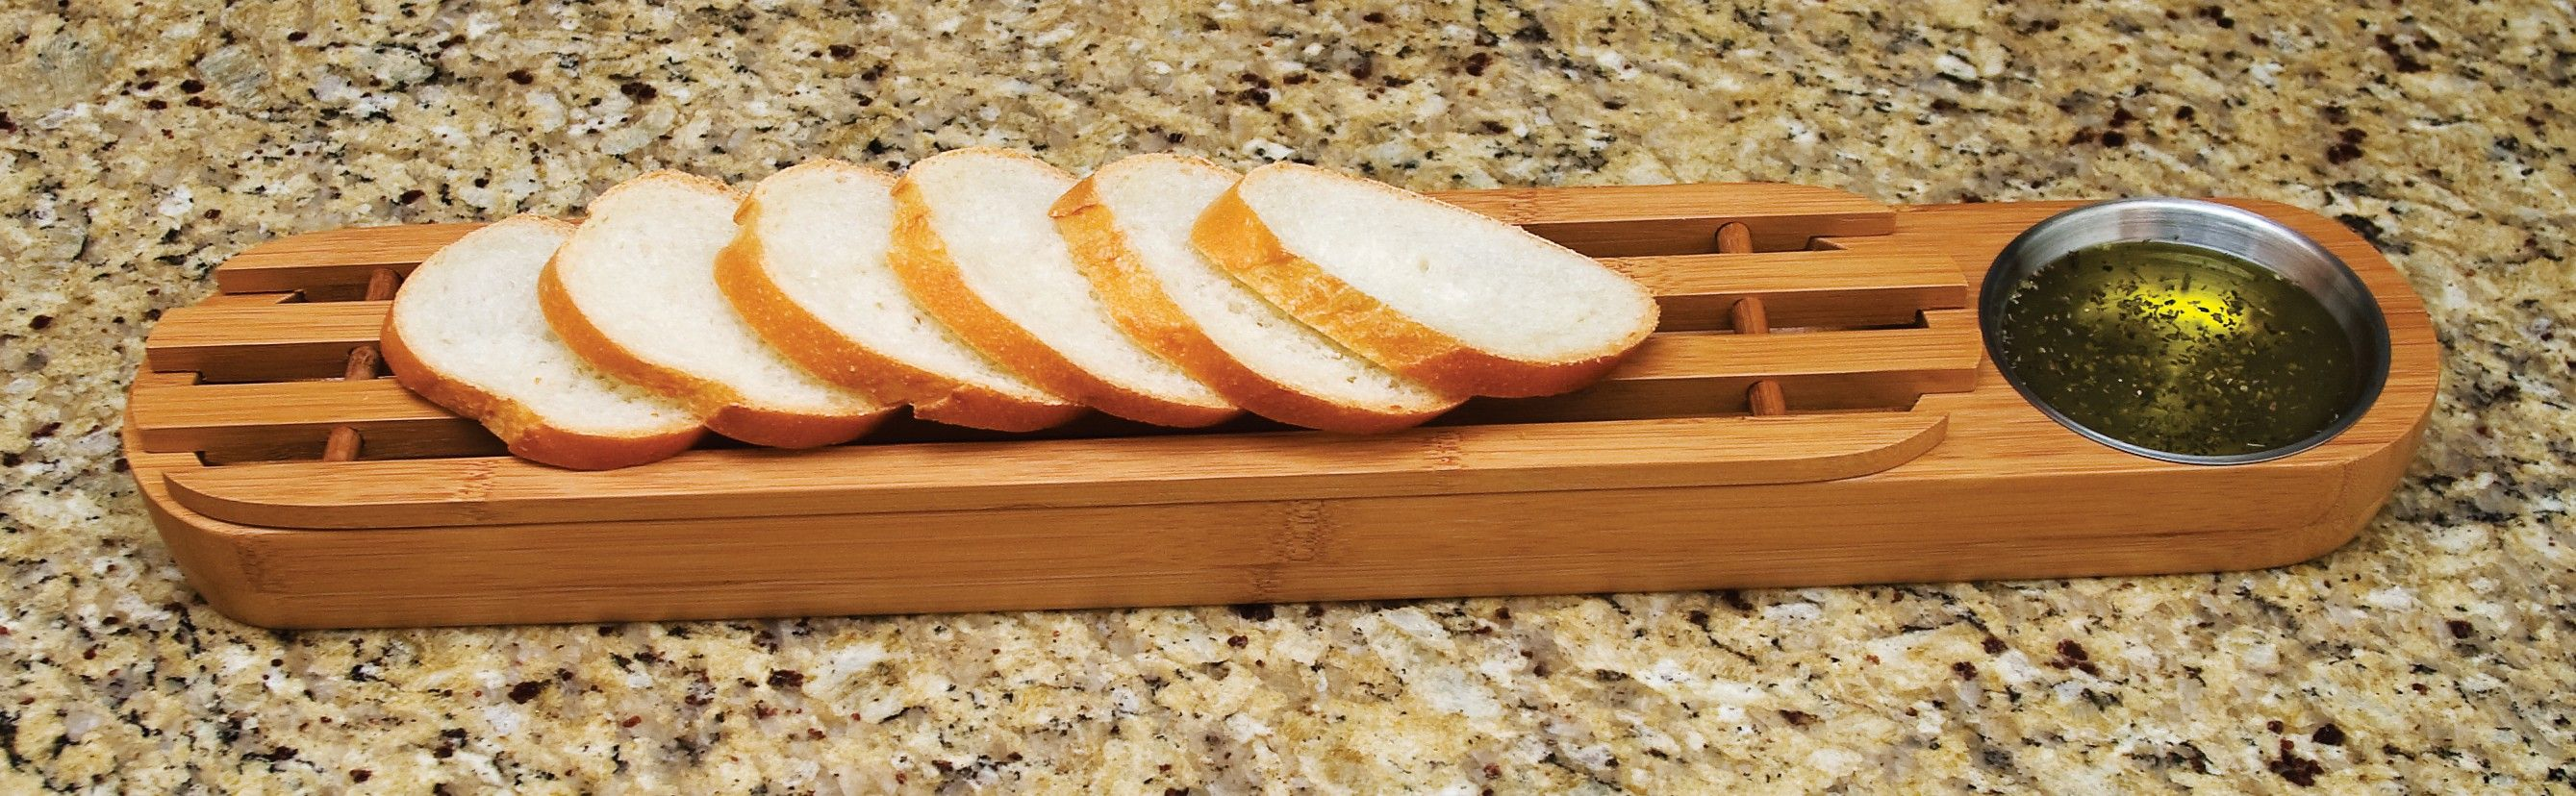 Lipper international 8241 bamboo bread board w stainless